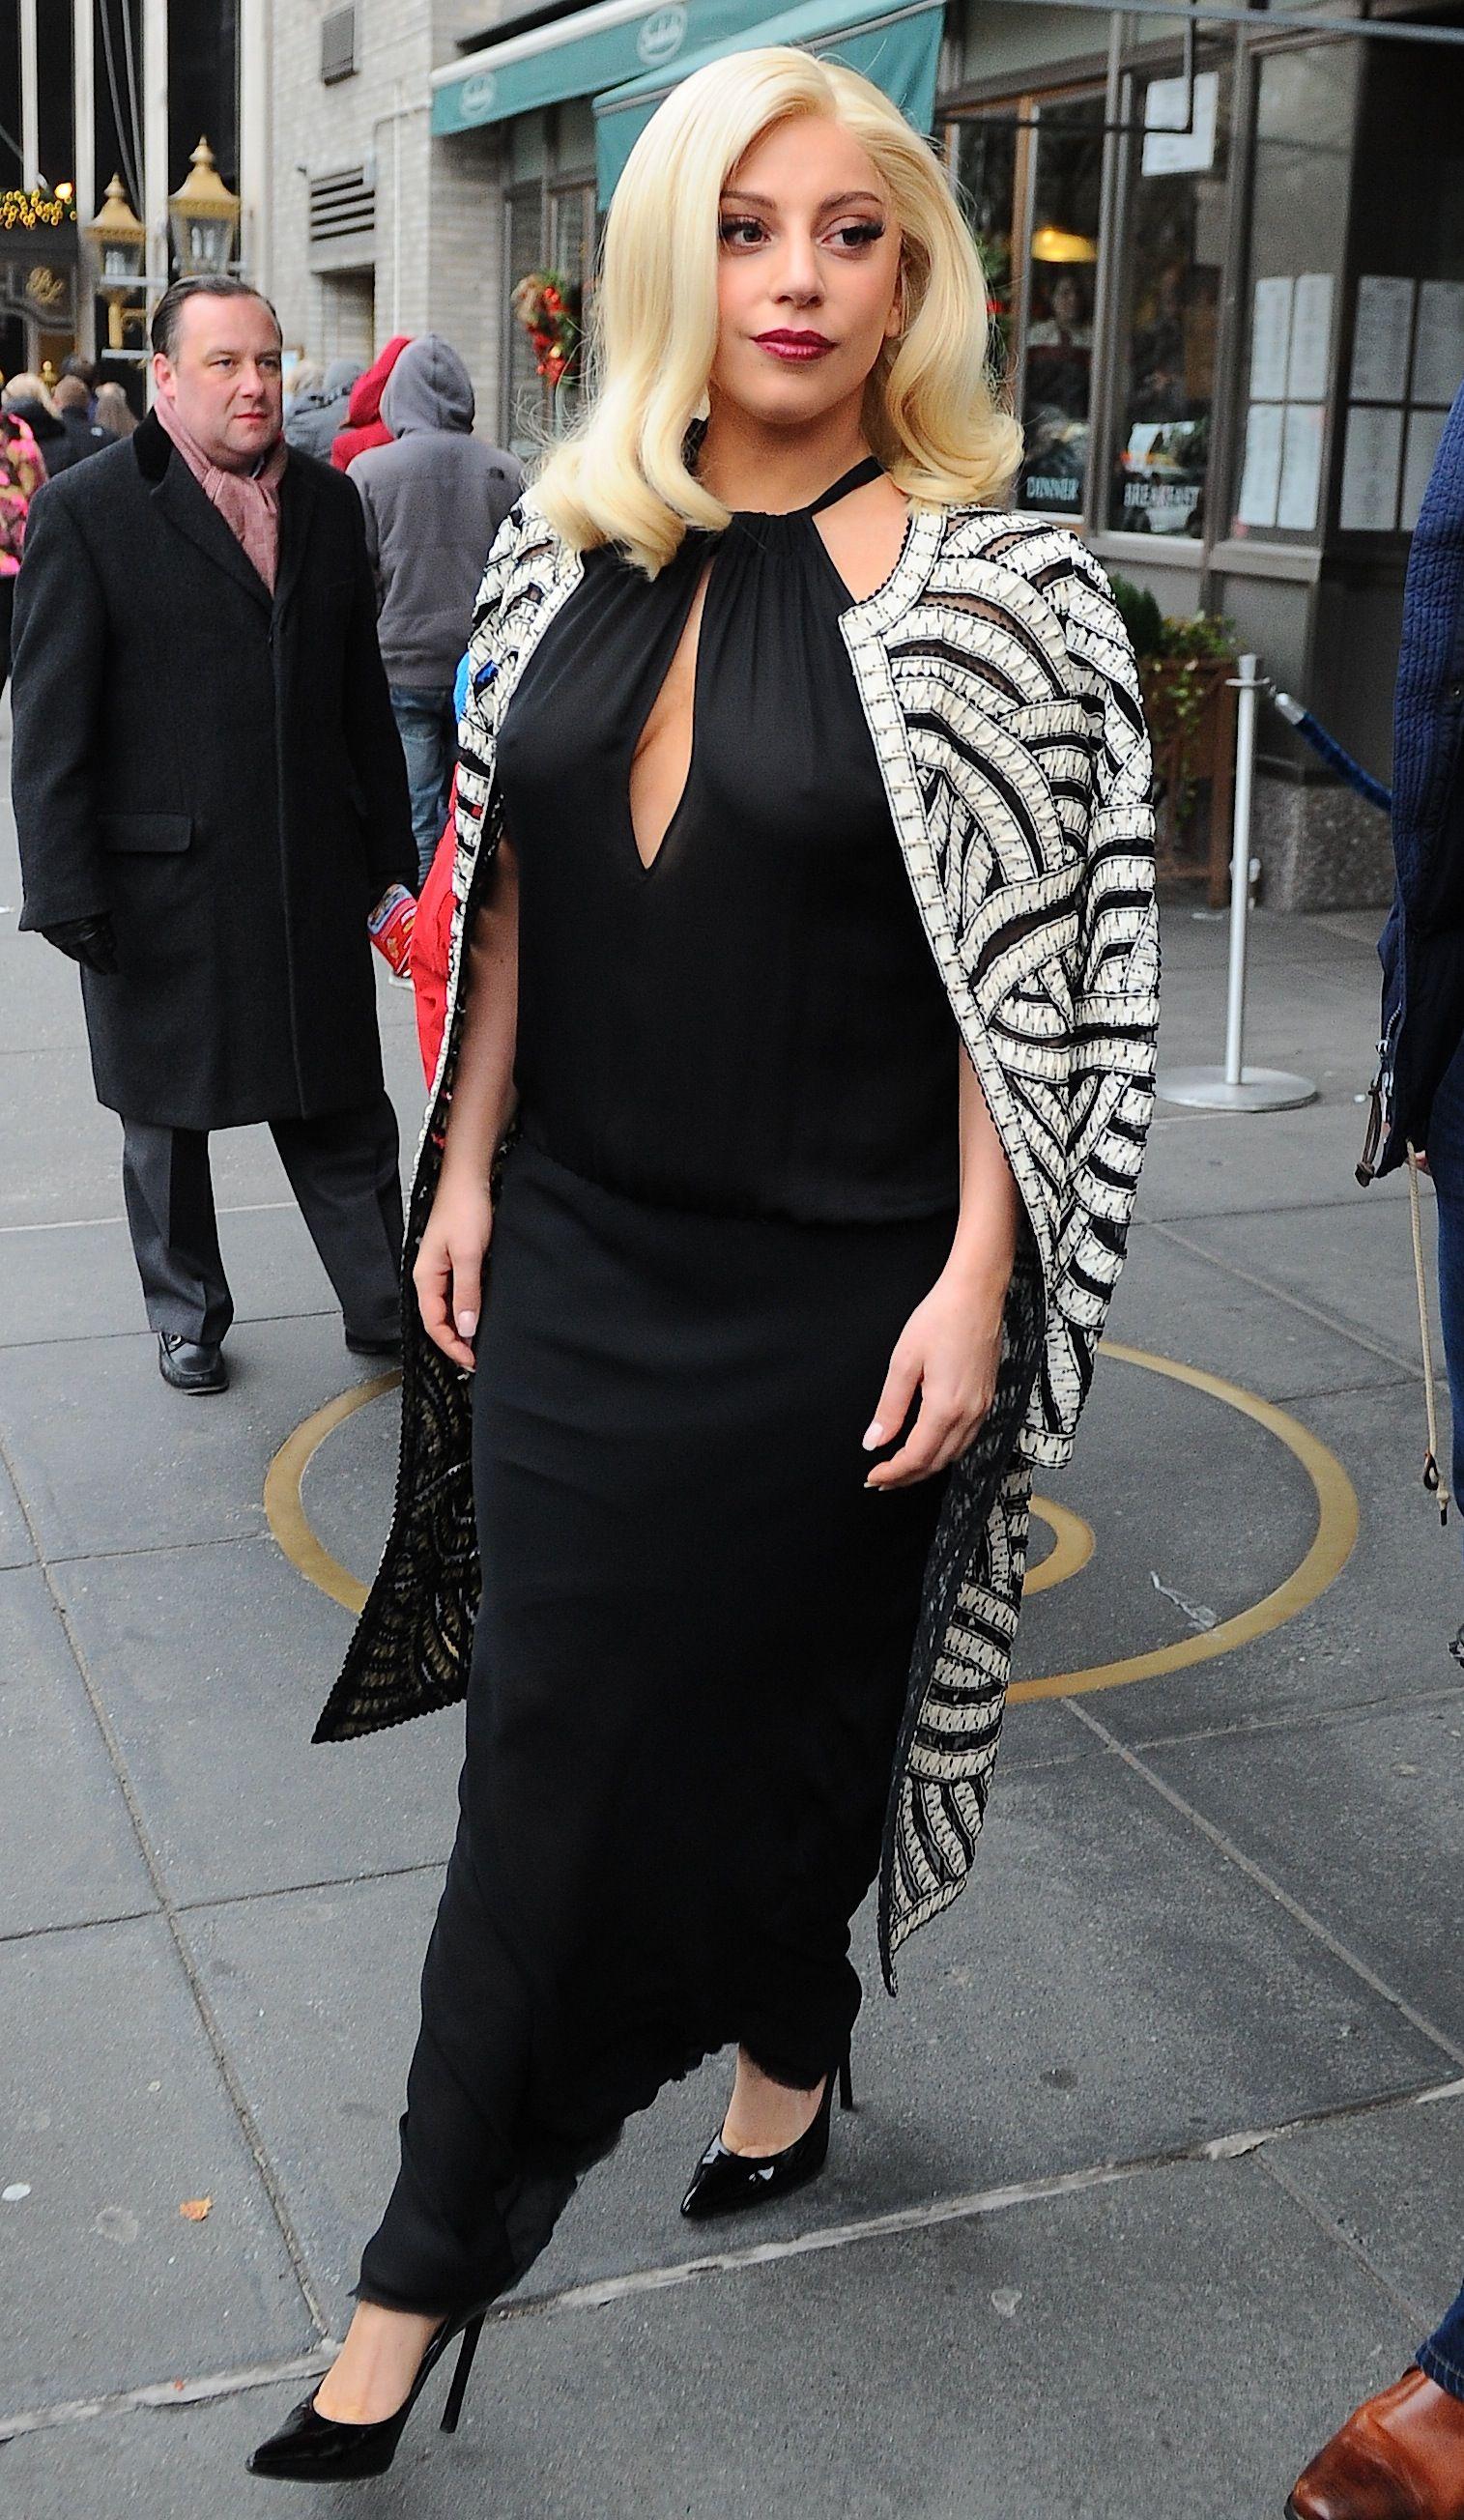 a34bb70c9b Gaga leaving her hotel - december 20